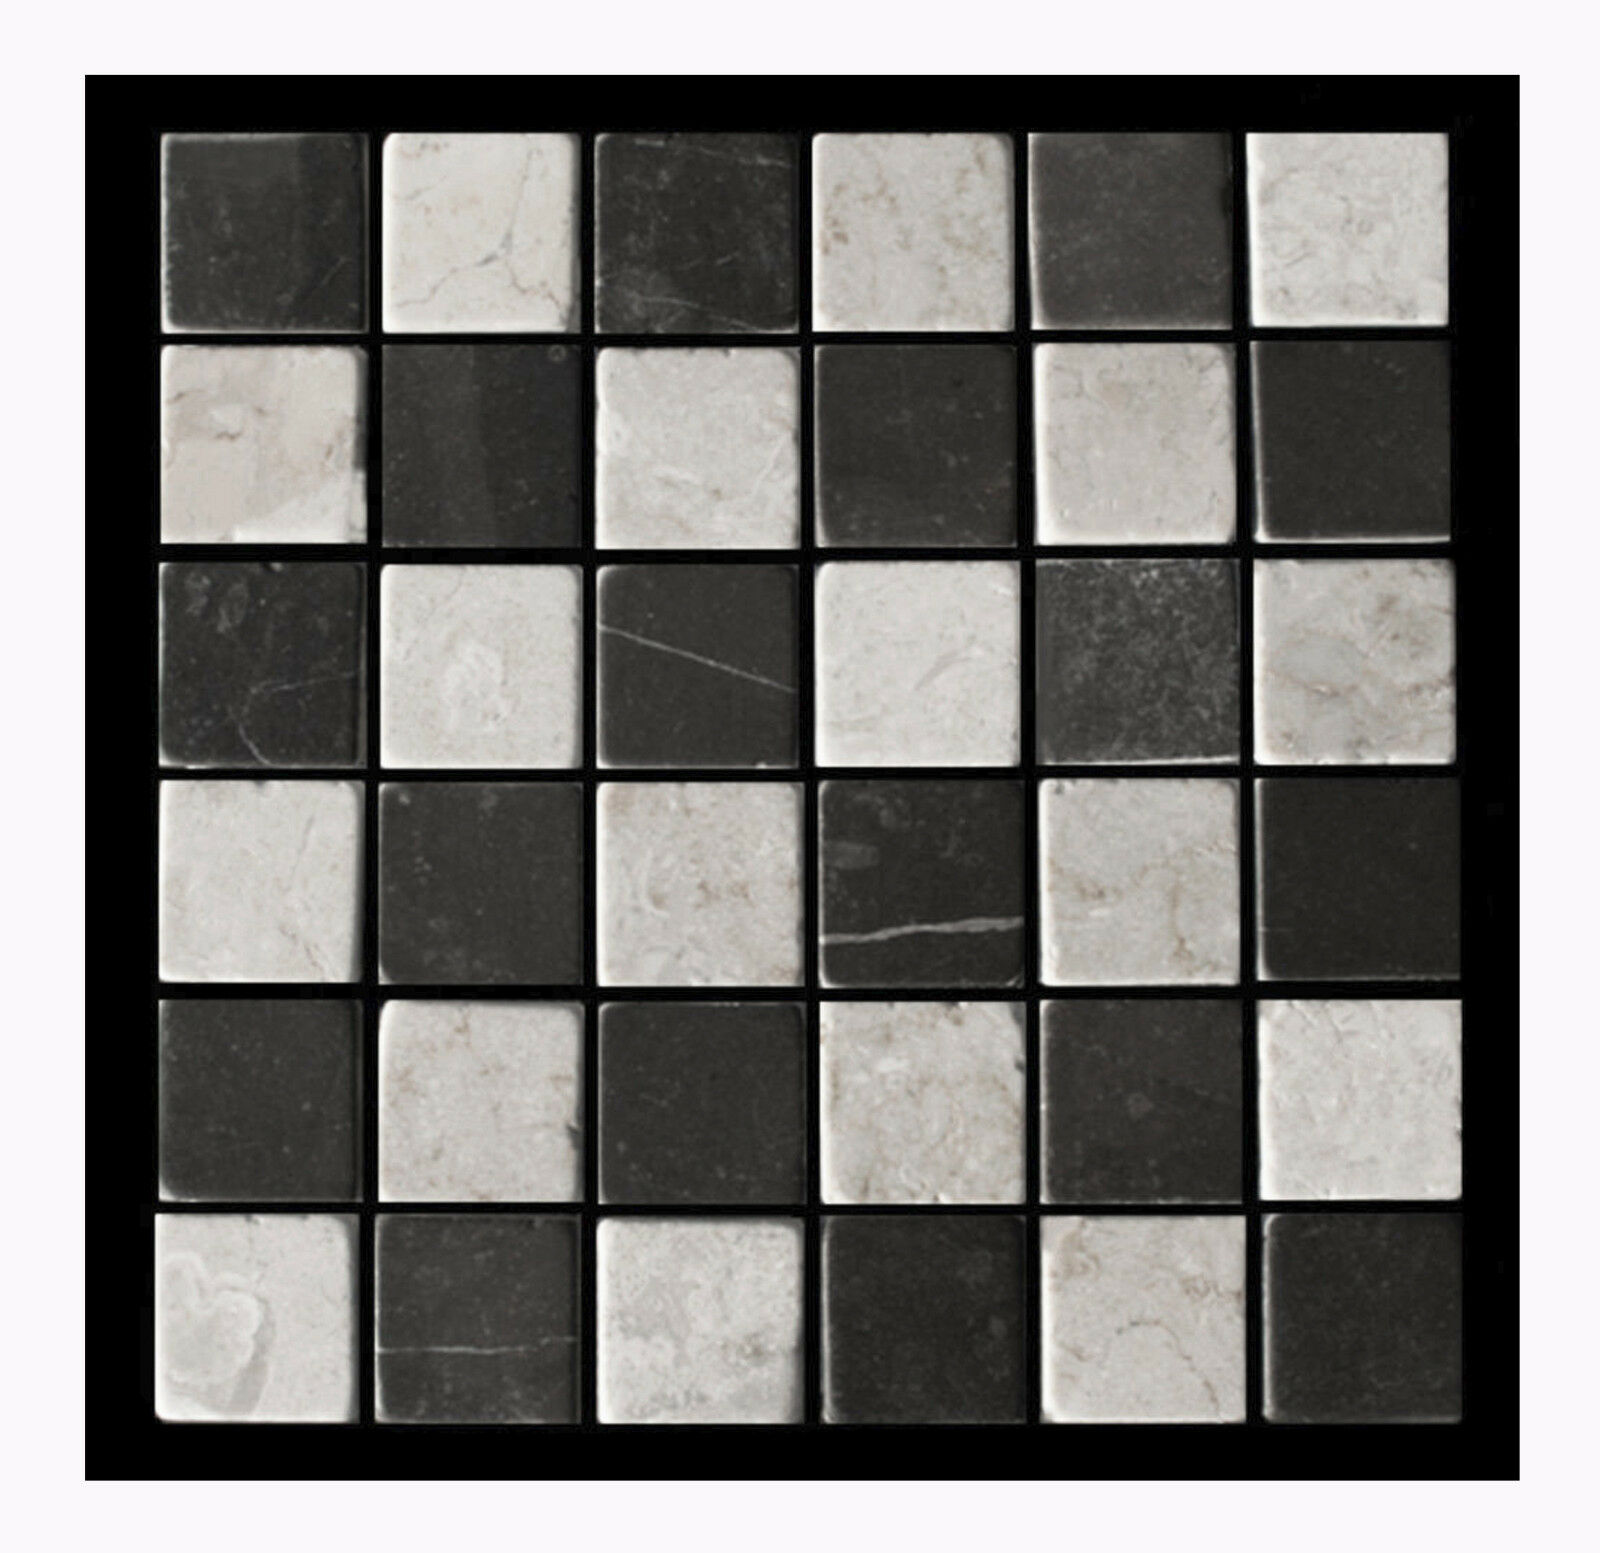 1 qm Marmor PA-806 - Mosaik Fliesen Lager Steinmosaik Herne NRW - Wand-Design